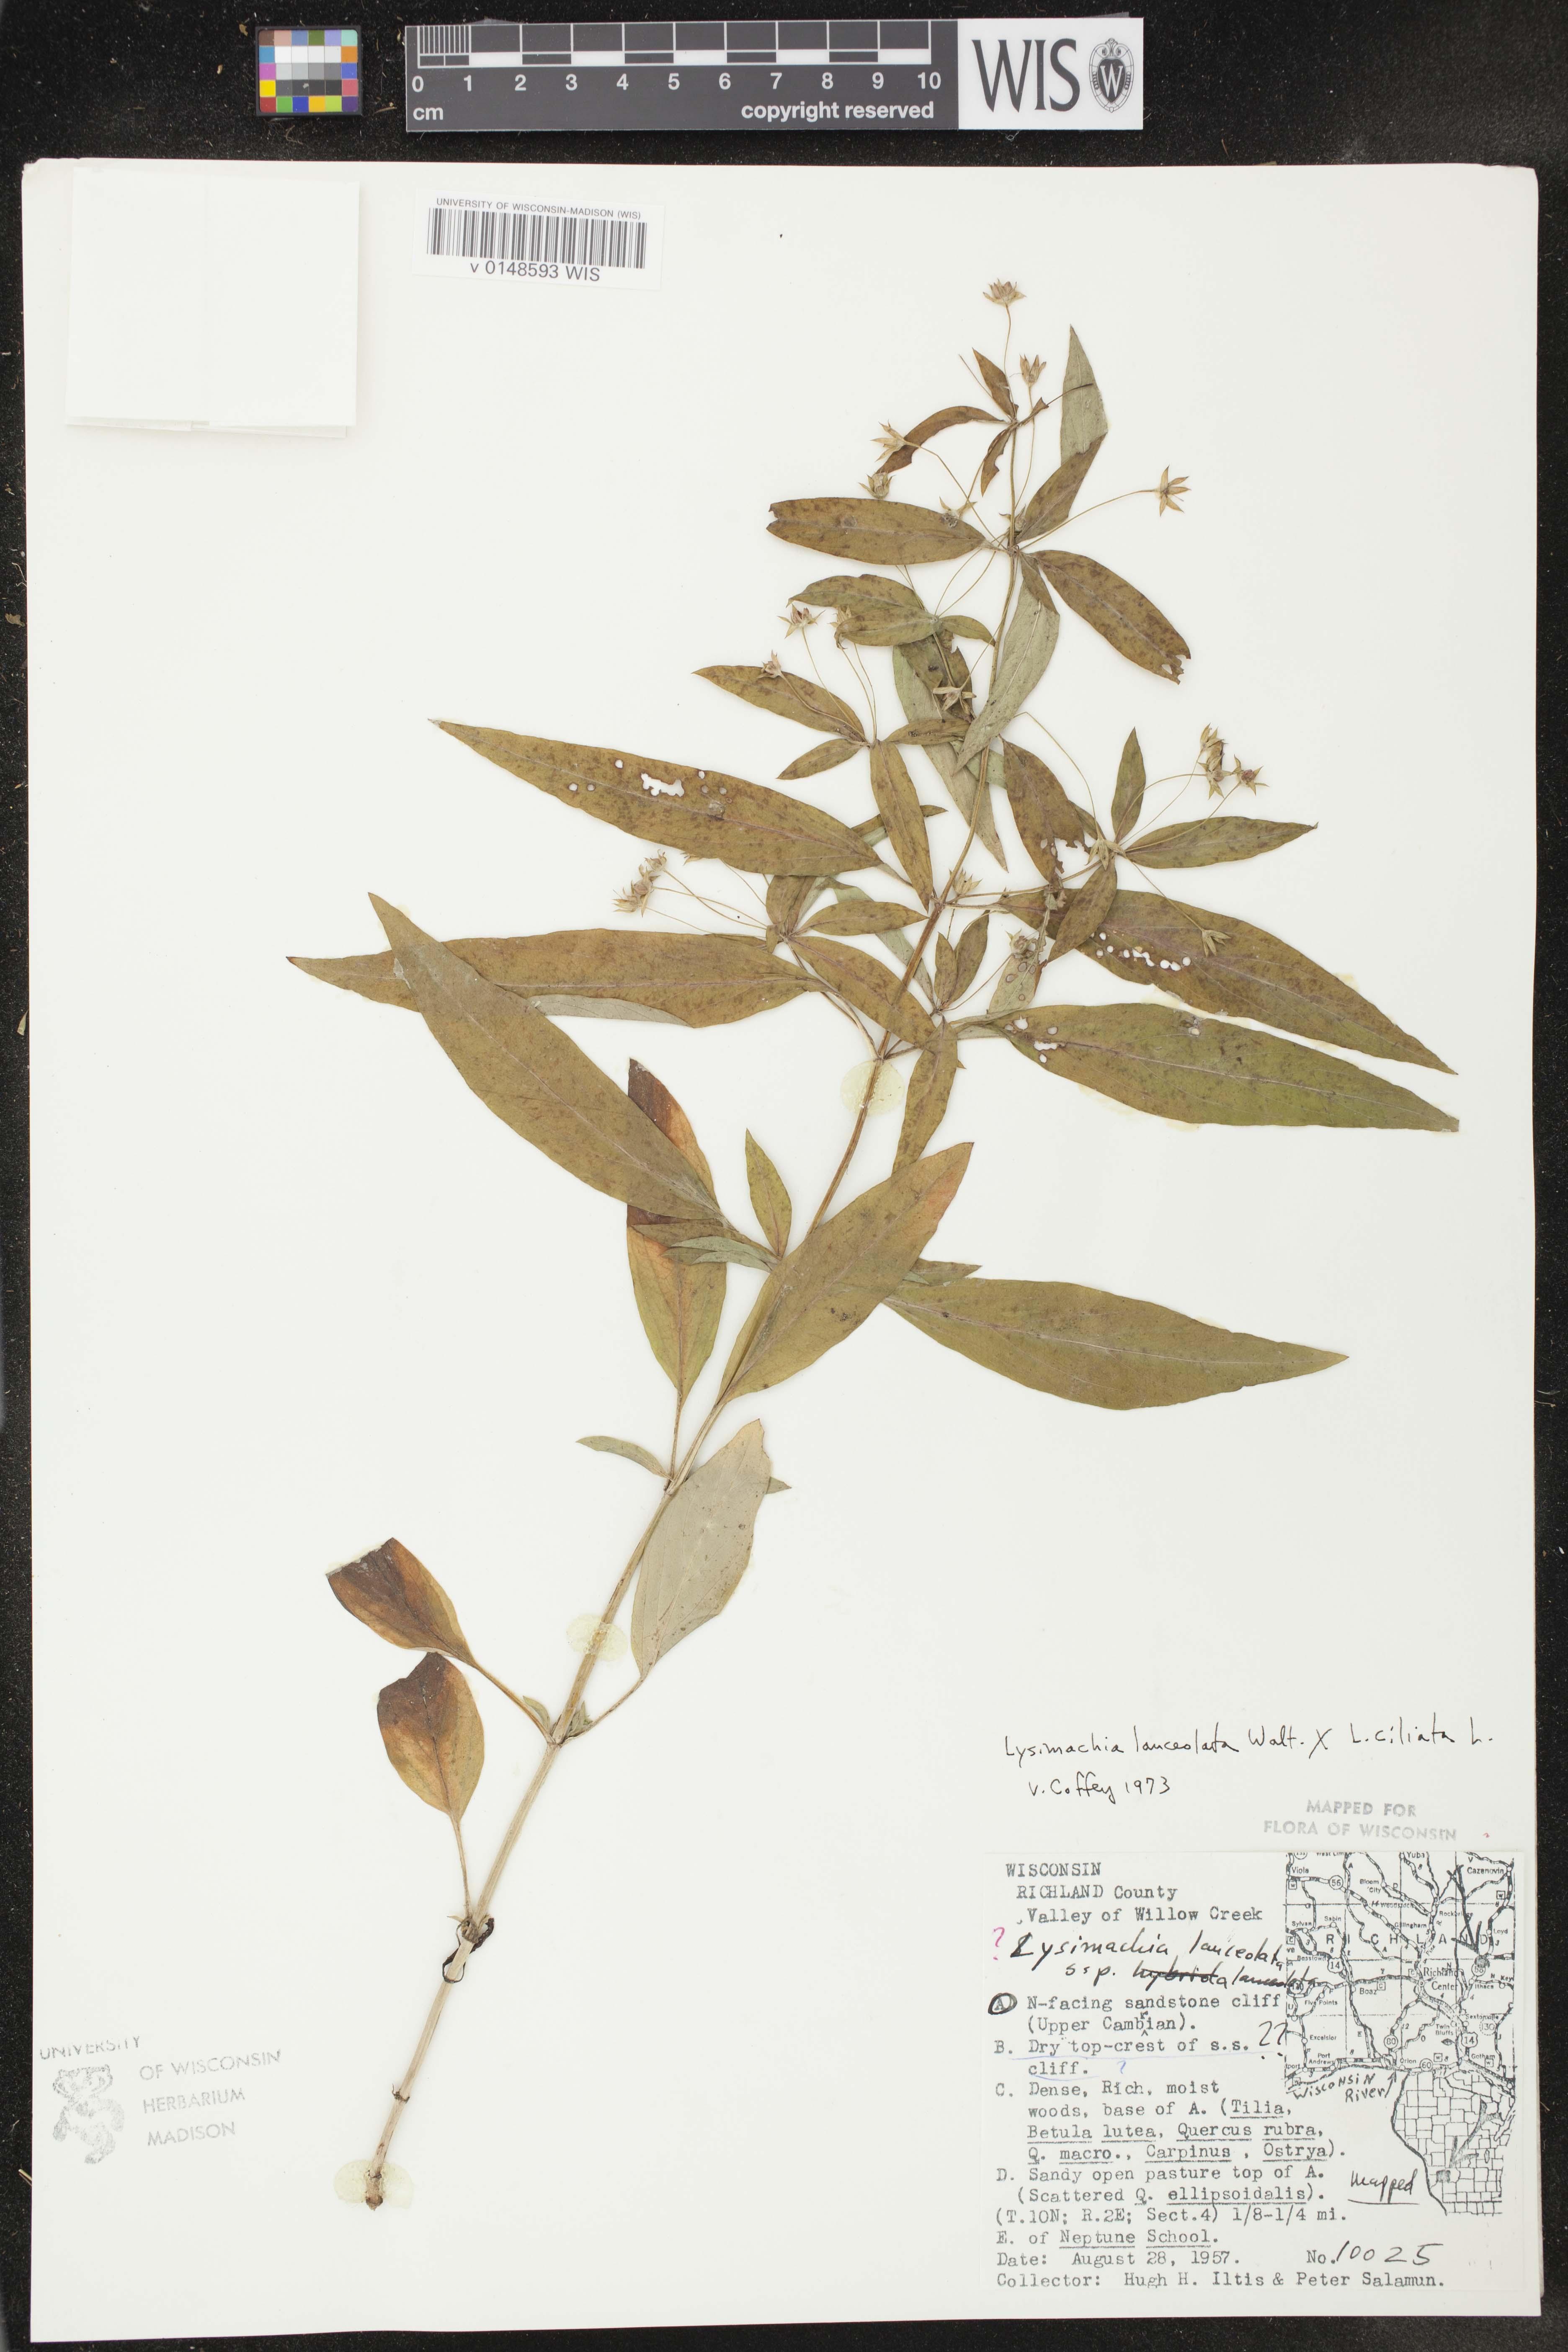 Image of Lysimachia ciliata x l. lanceolata